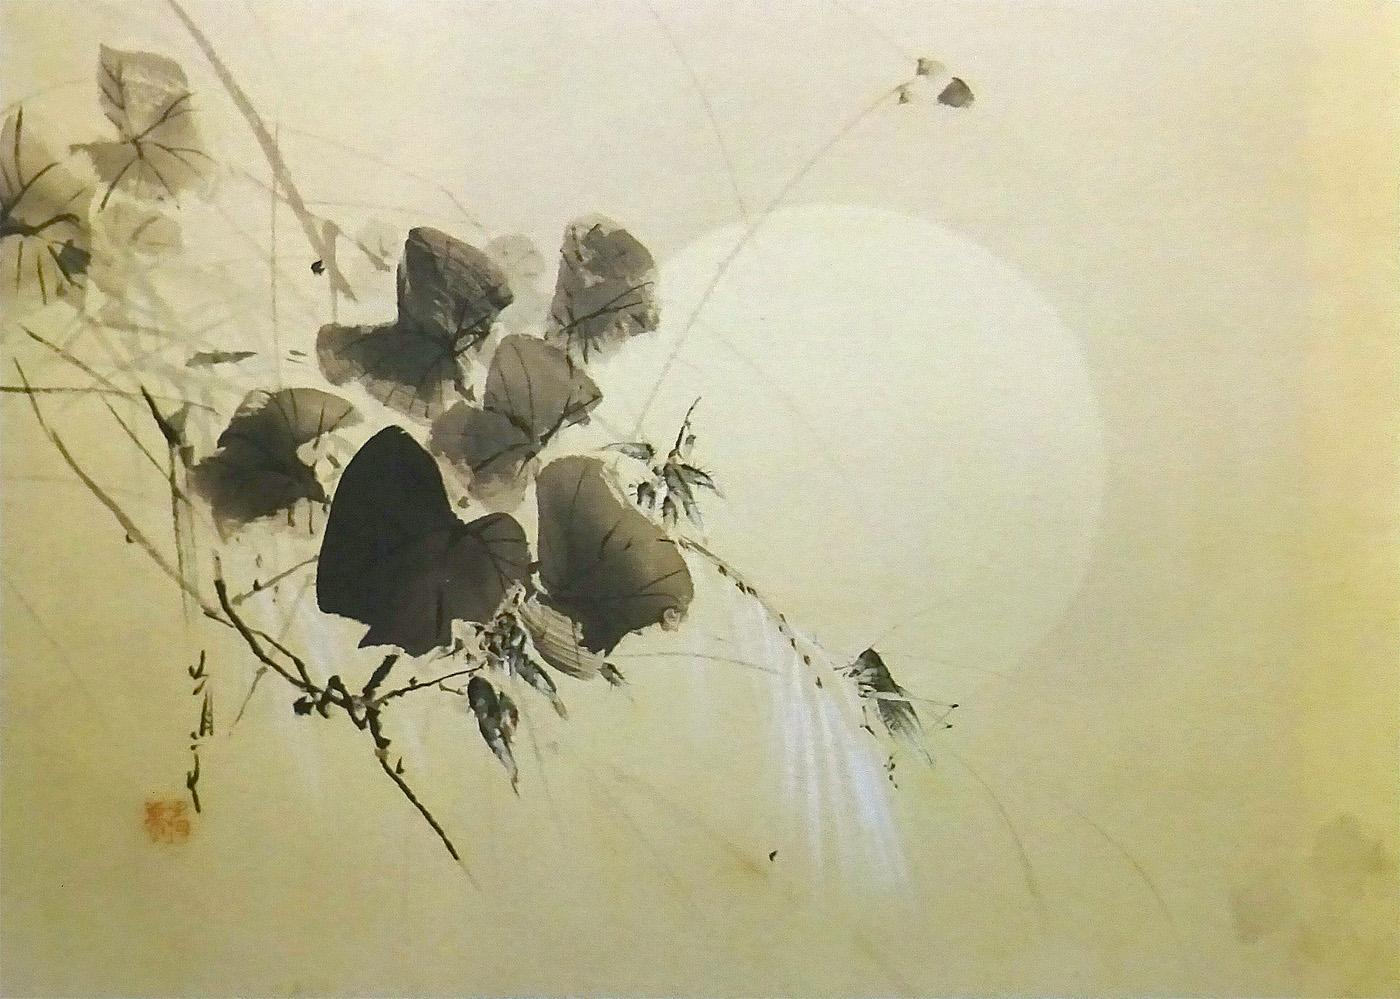 渡辺省亭の画像 p1_32